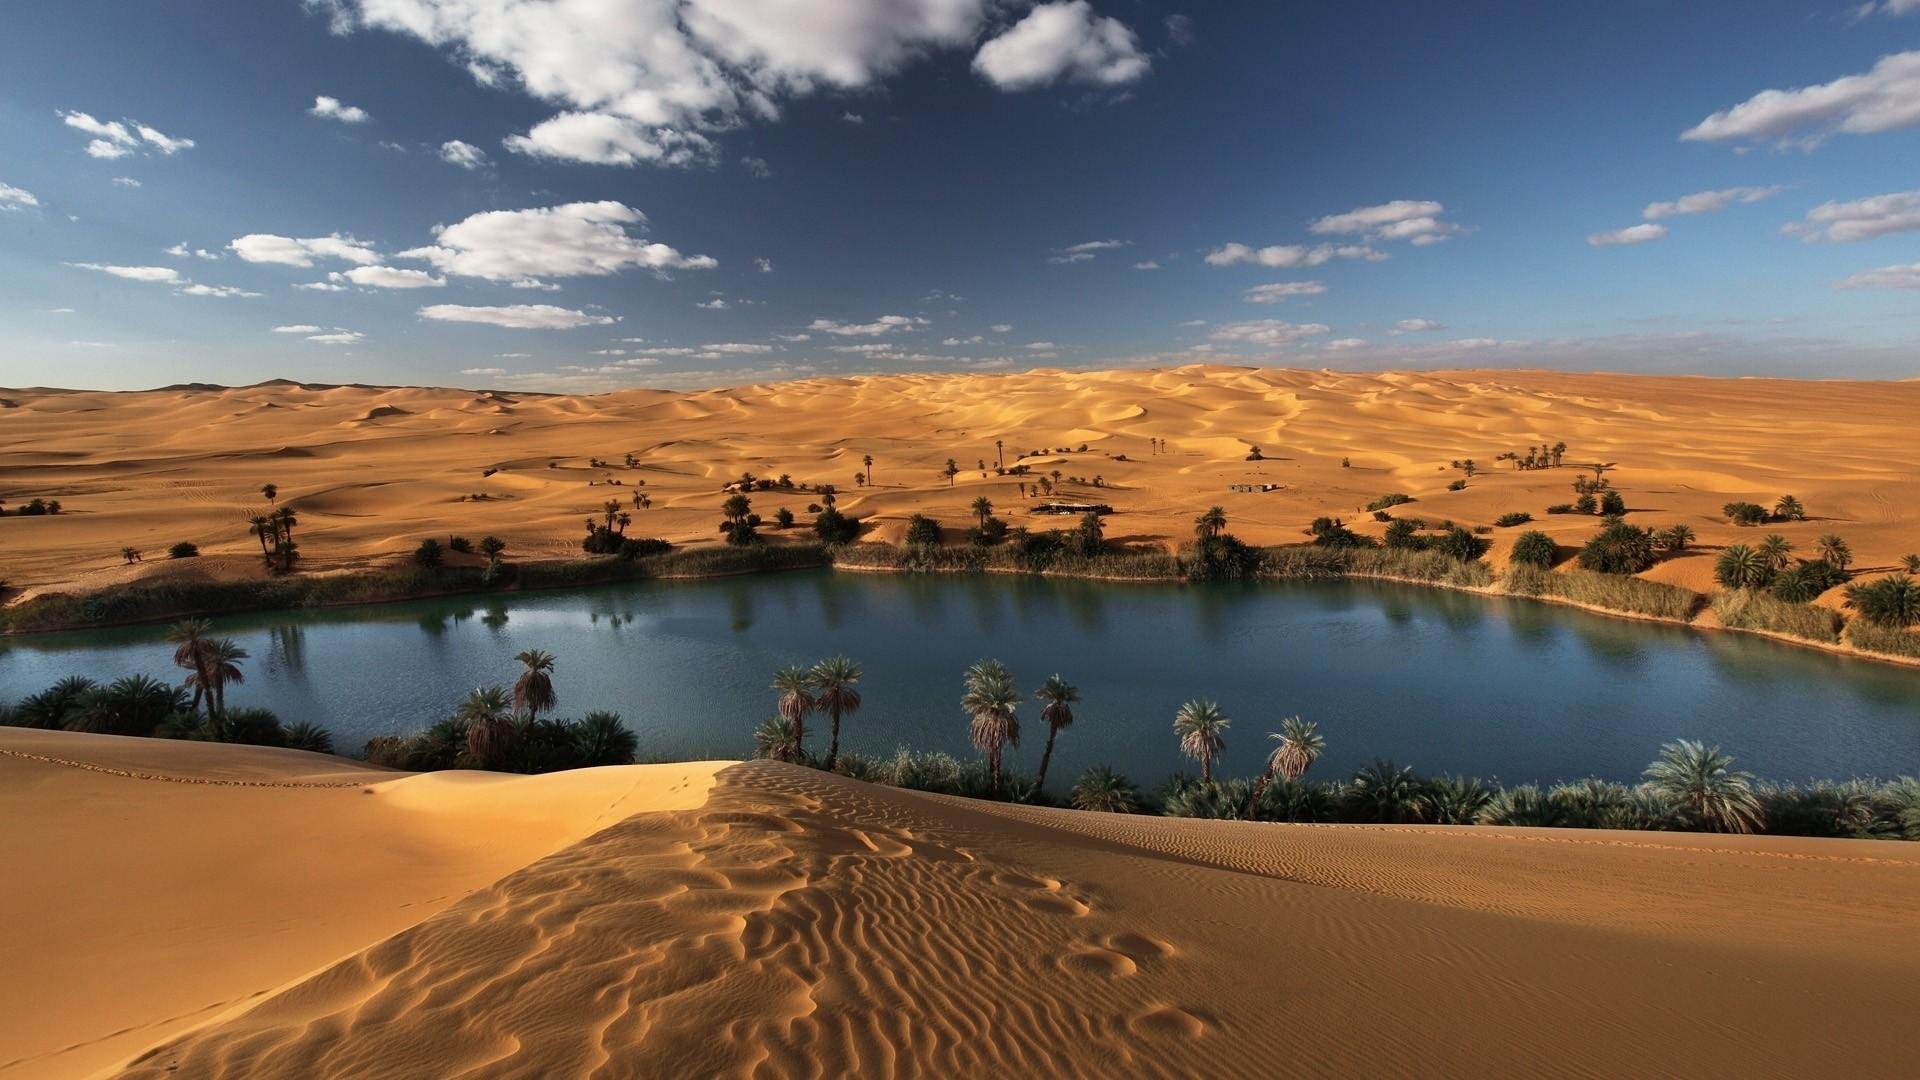 Sahara wallpaper for computer